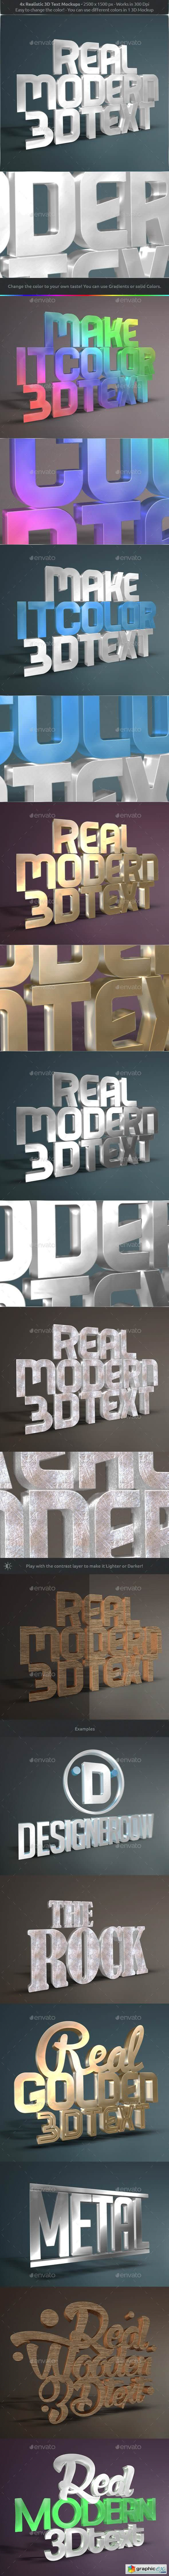 Real 3D Text Mockups V2